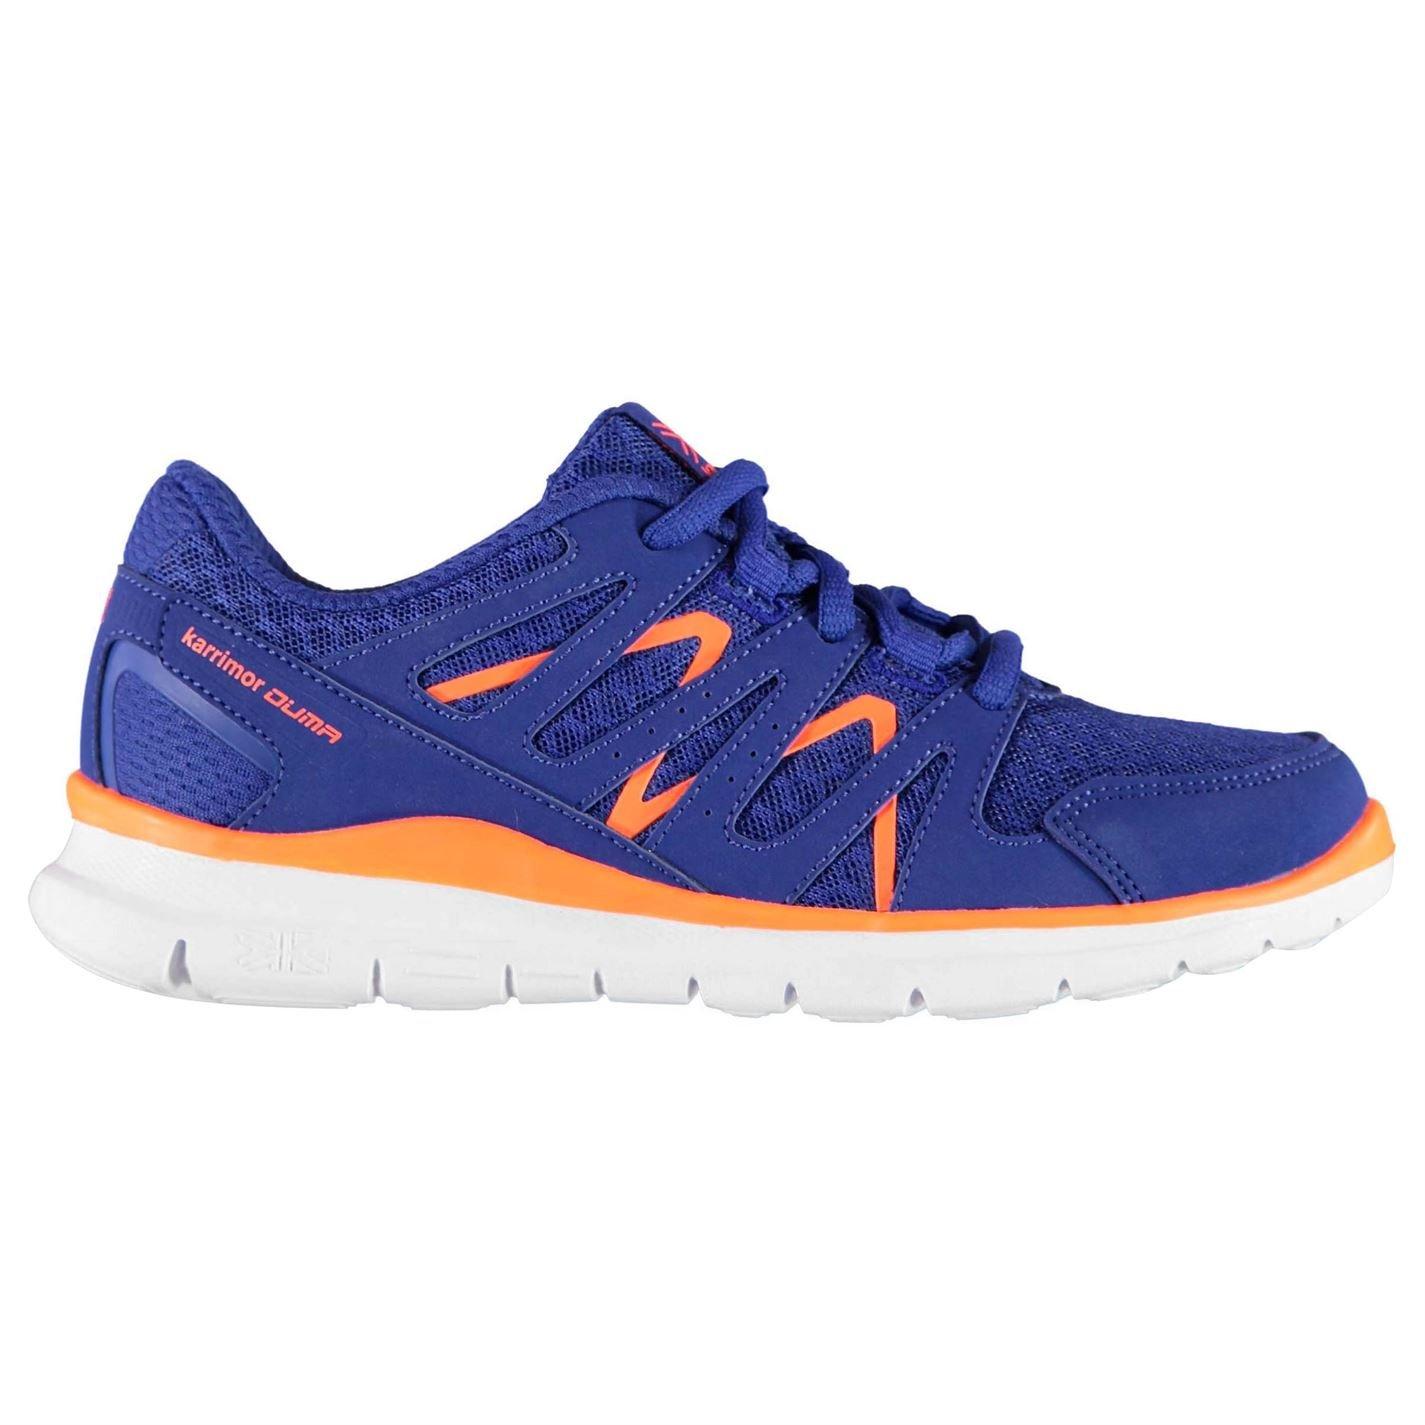 Karrimor Kids Duma Running Trainers Boys Shoes Breathable Mesh Sports Brilliant Blue UK C12 (31)